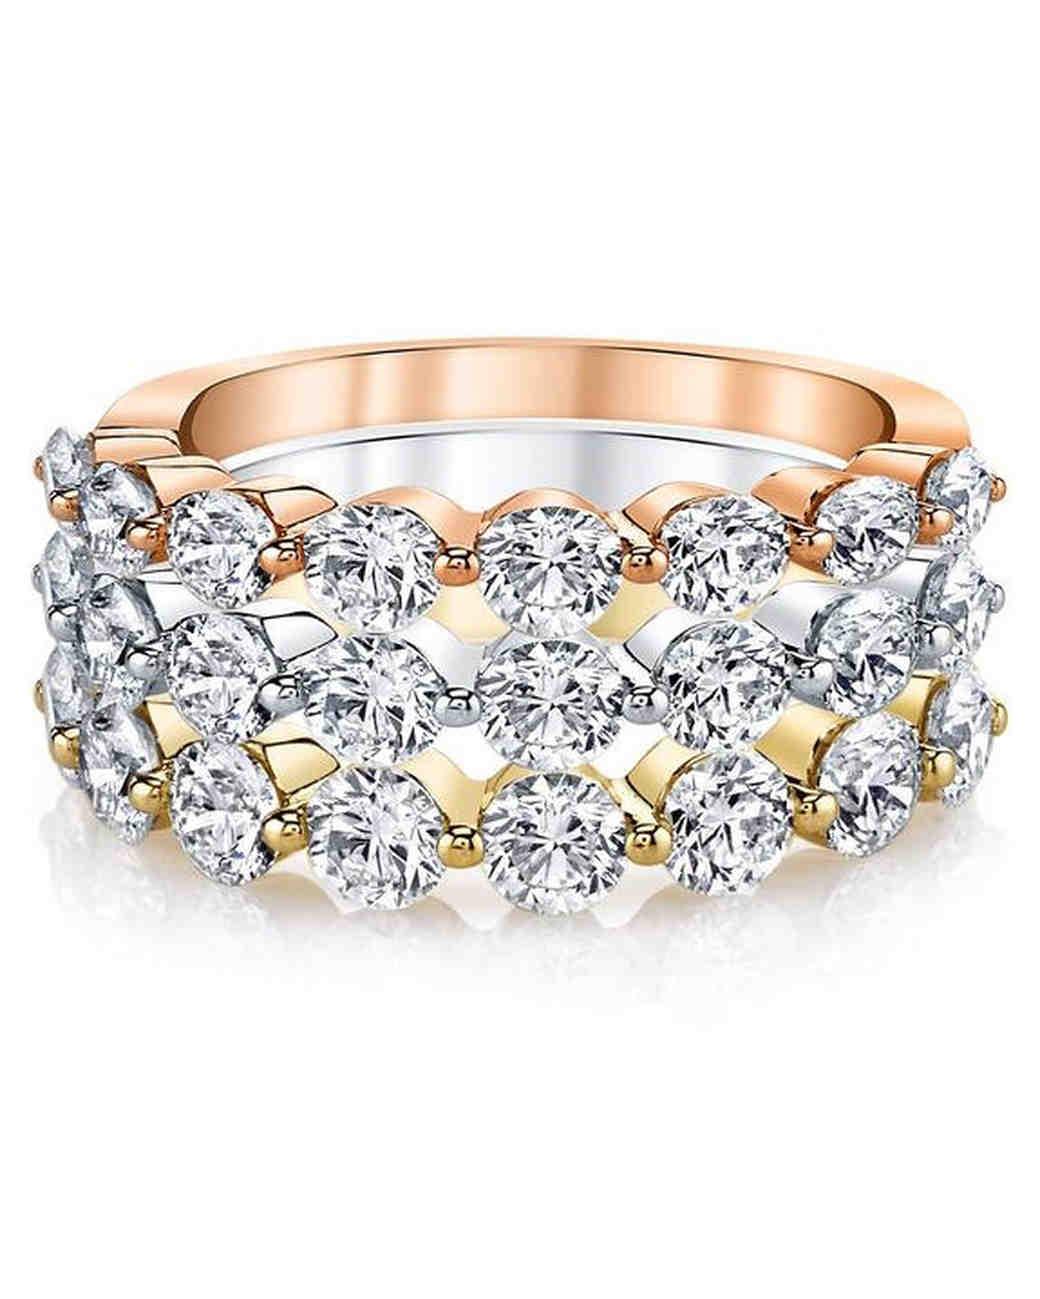 Anita Ko Floating Diamond Stackable Rings